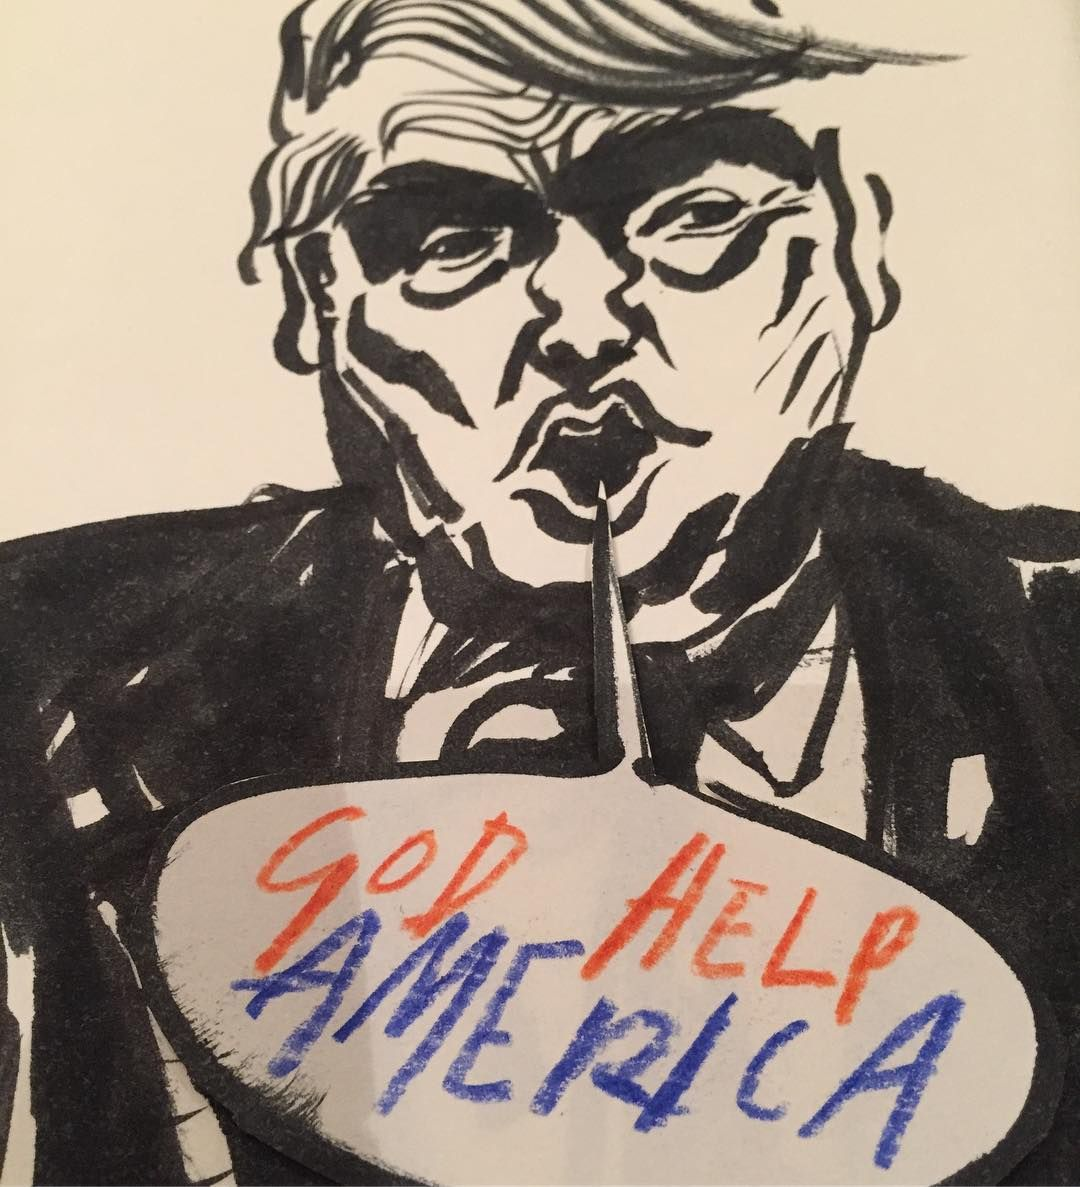 God Help America....#trumpinauguration #inauguration #trump #usa #election2016 #whitehouse #politricks #illustration #studiospilsbury #drawing #artist #brushpen #ink #cartoon